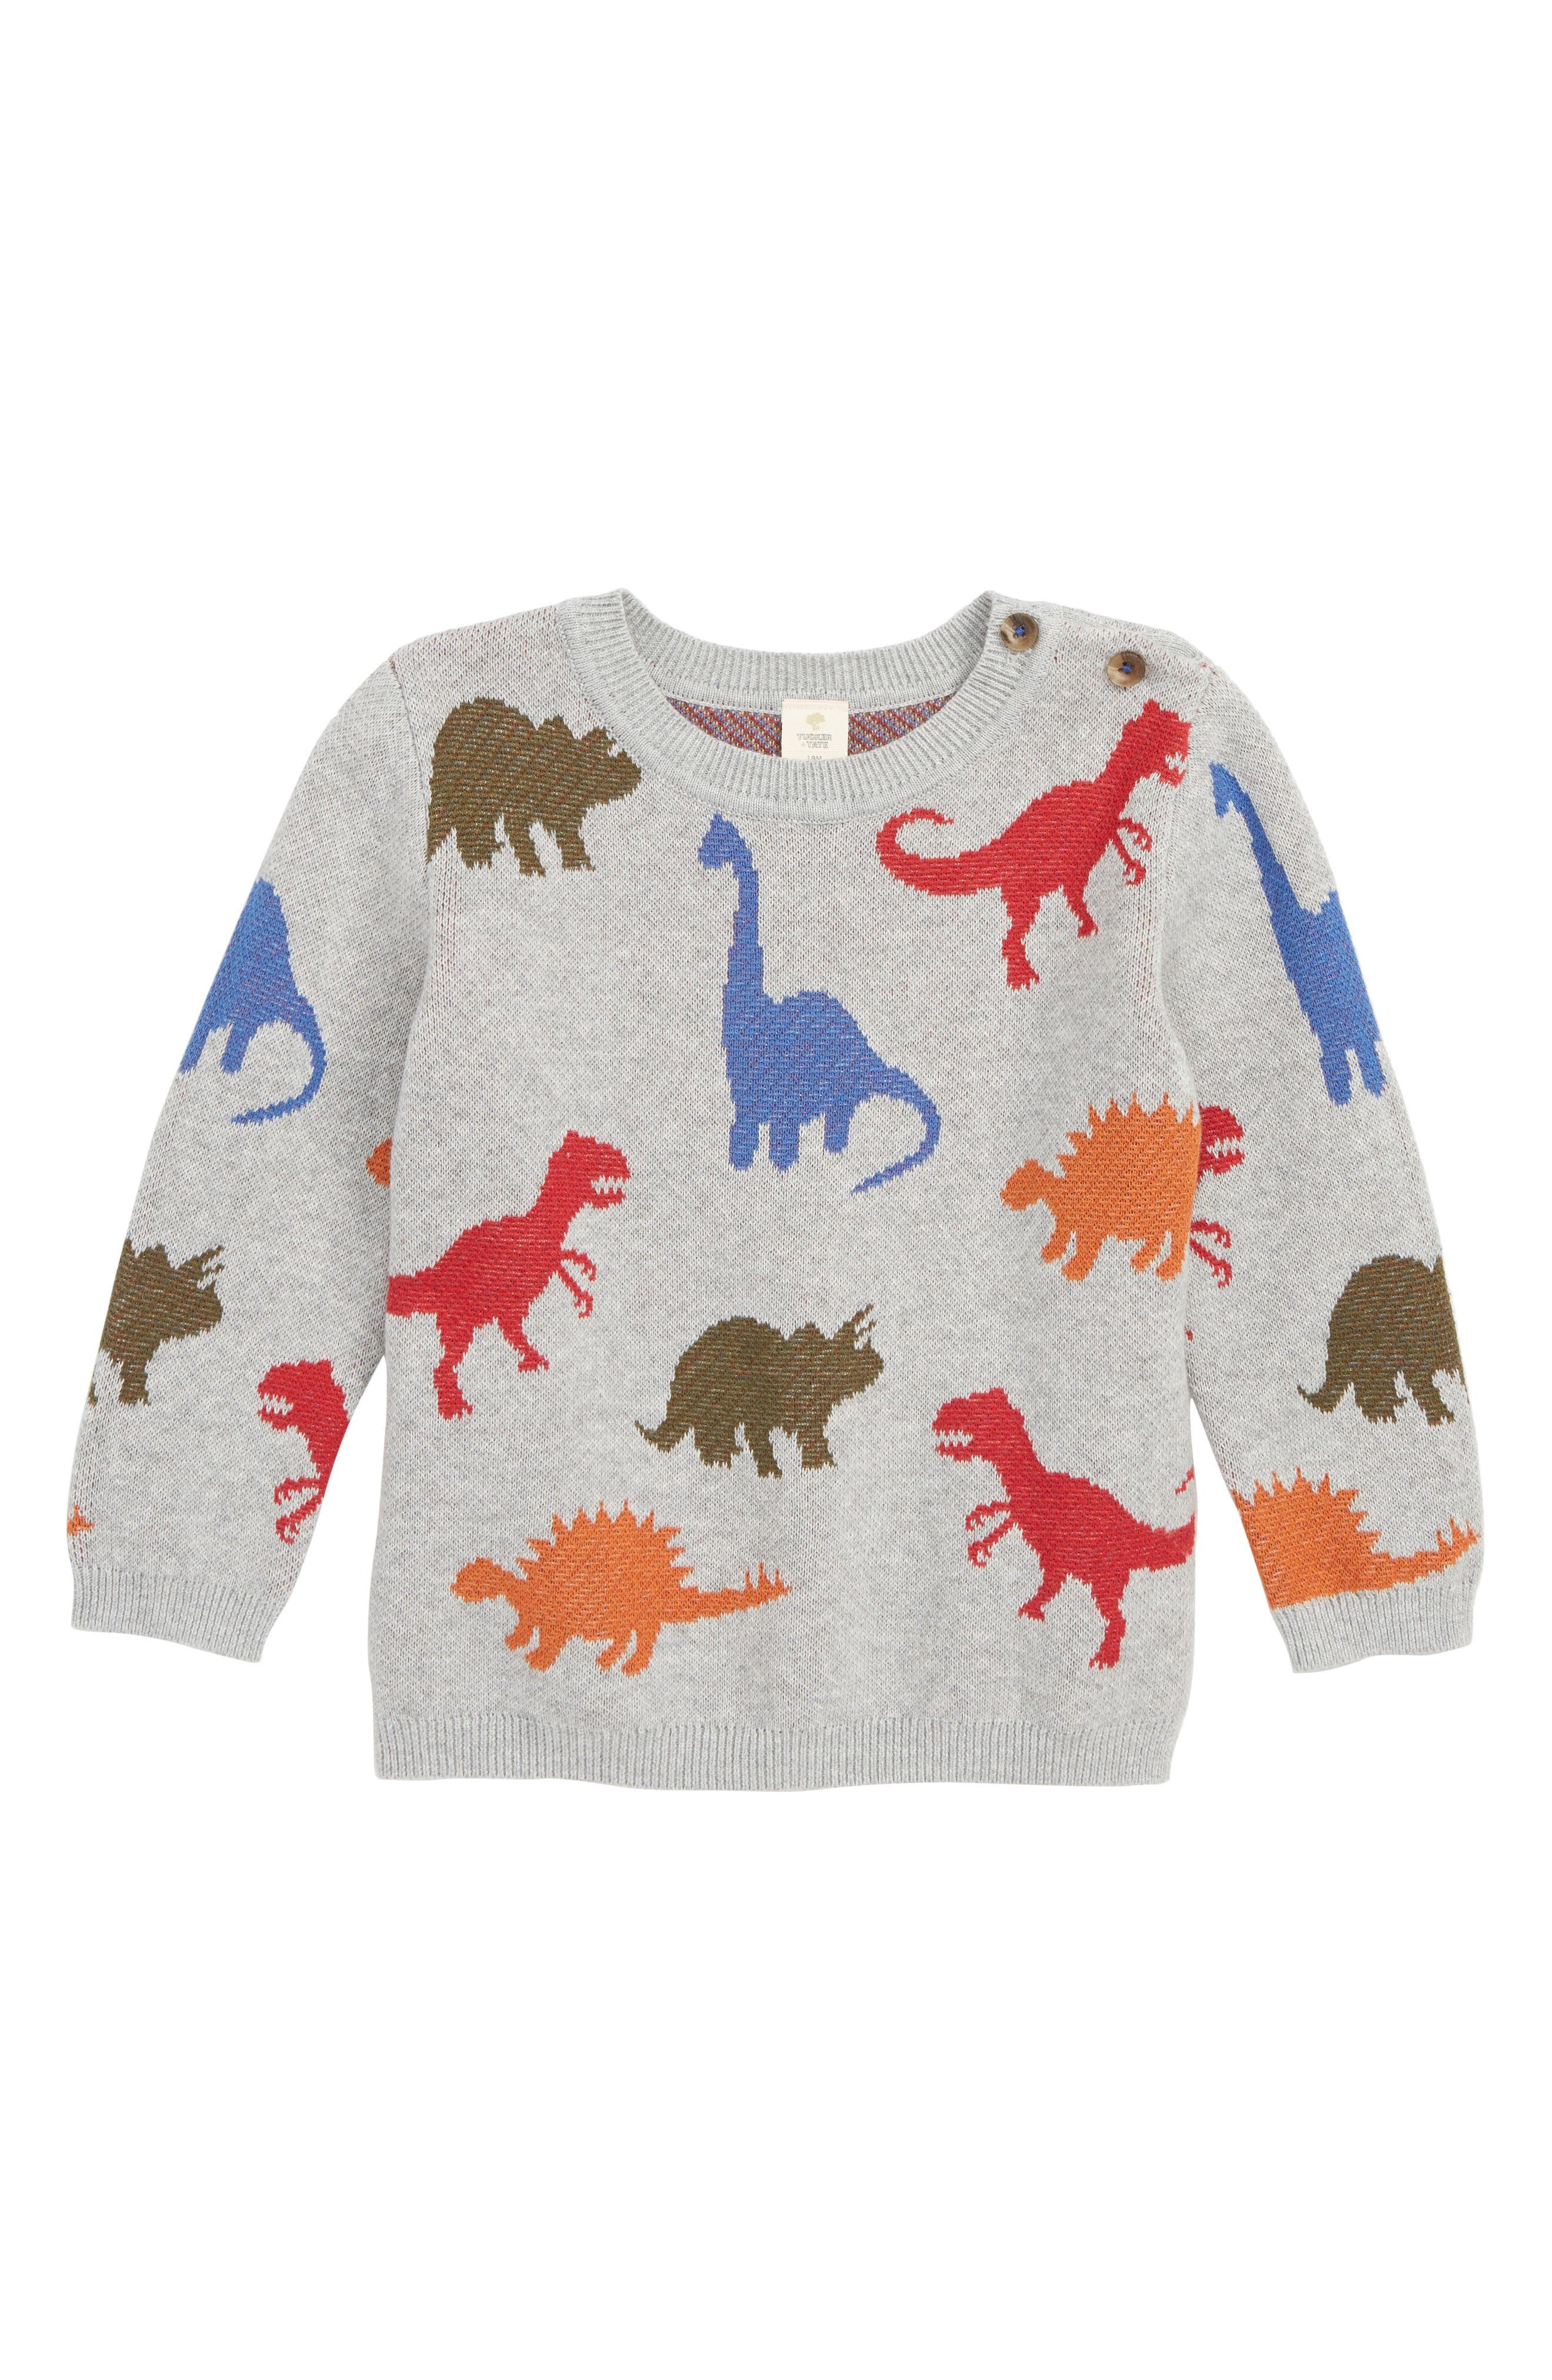 Dinosaur Sweater,                             Main thumbnail 1, color,                             050